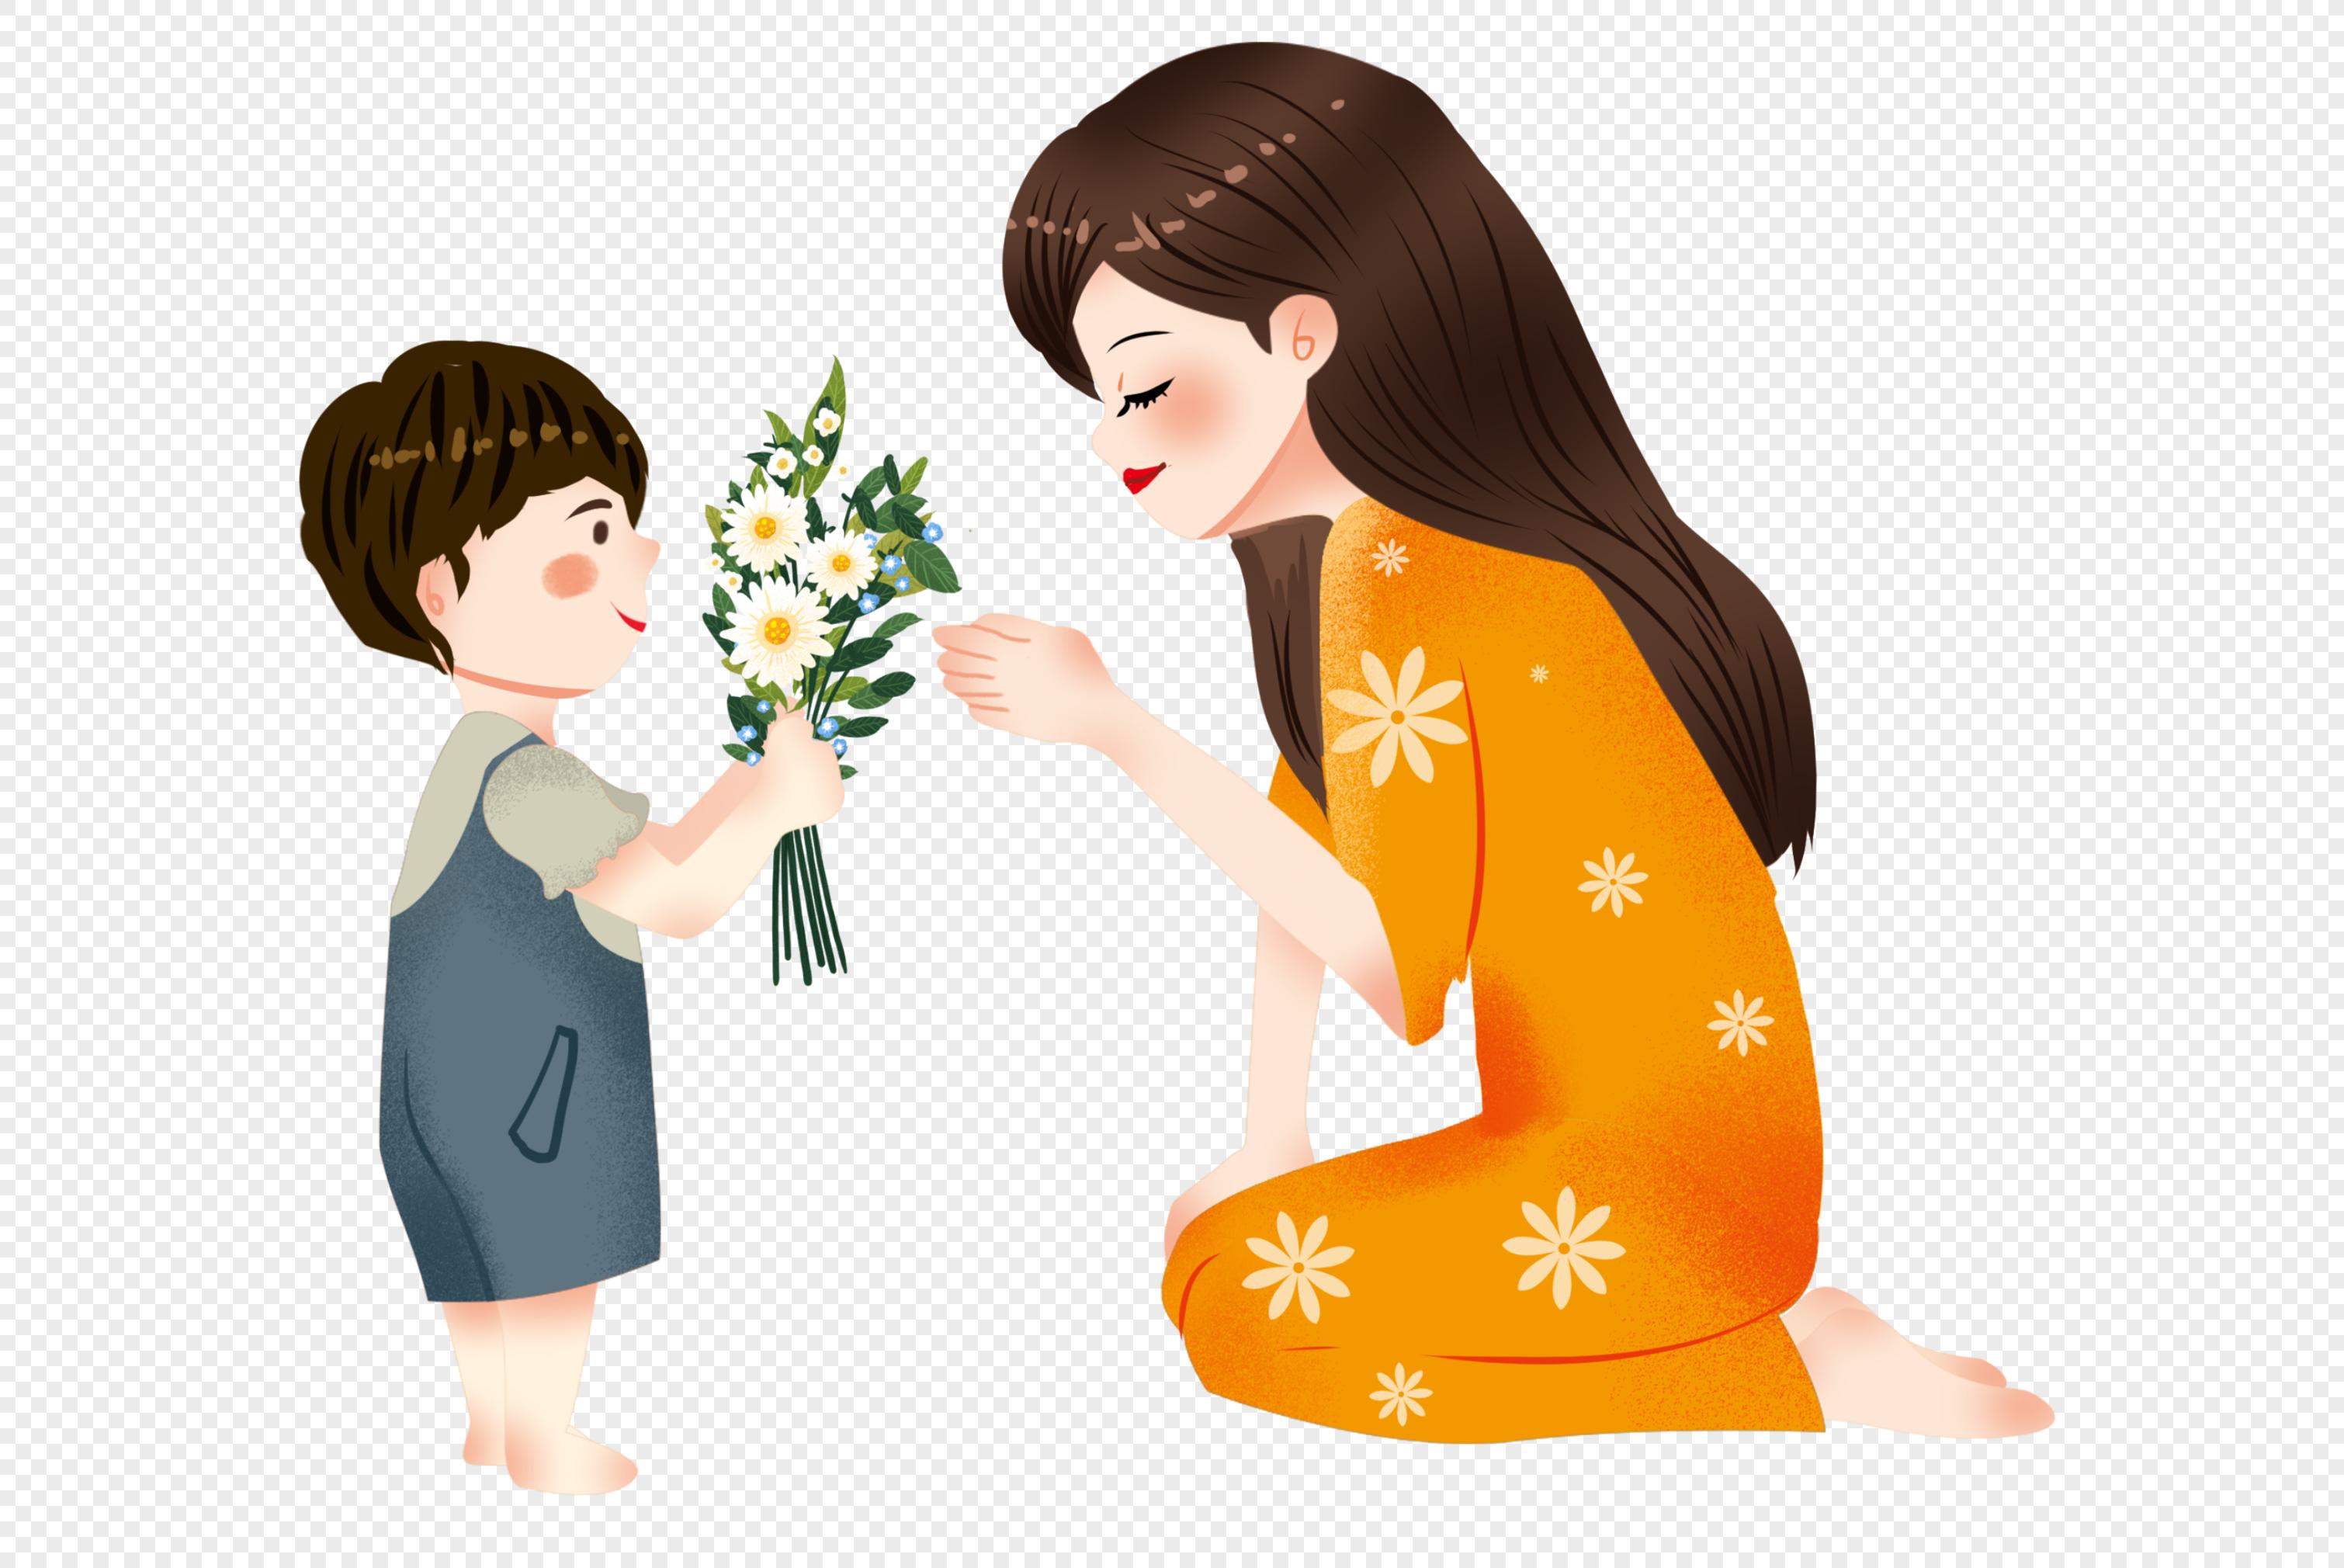 Рисунок мальчик дарит цветы маме